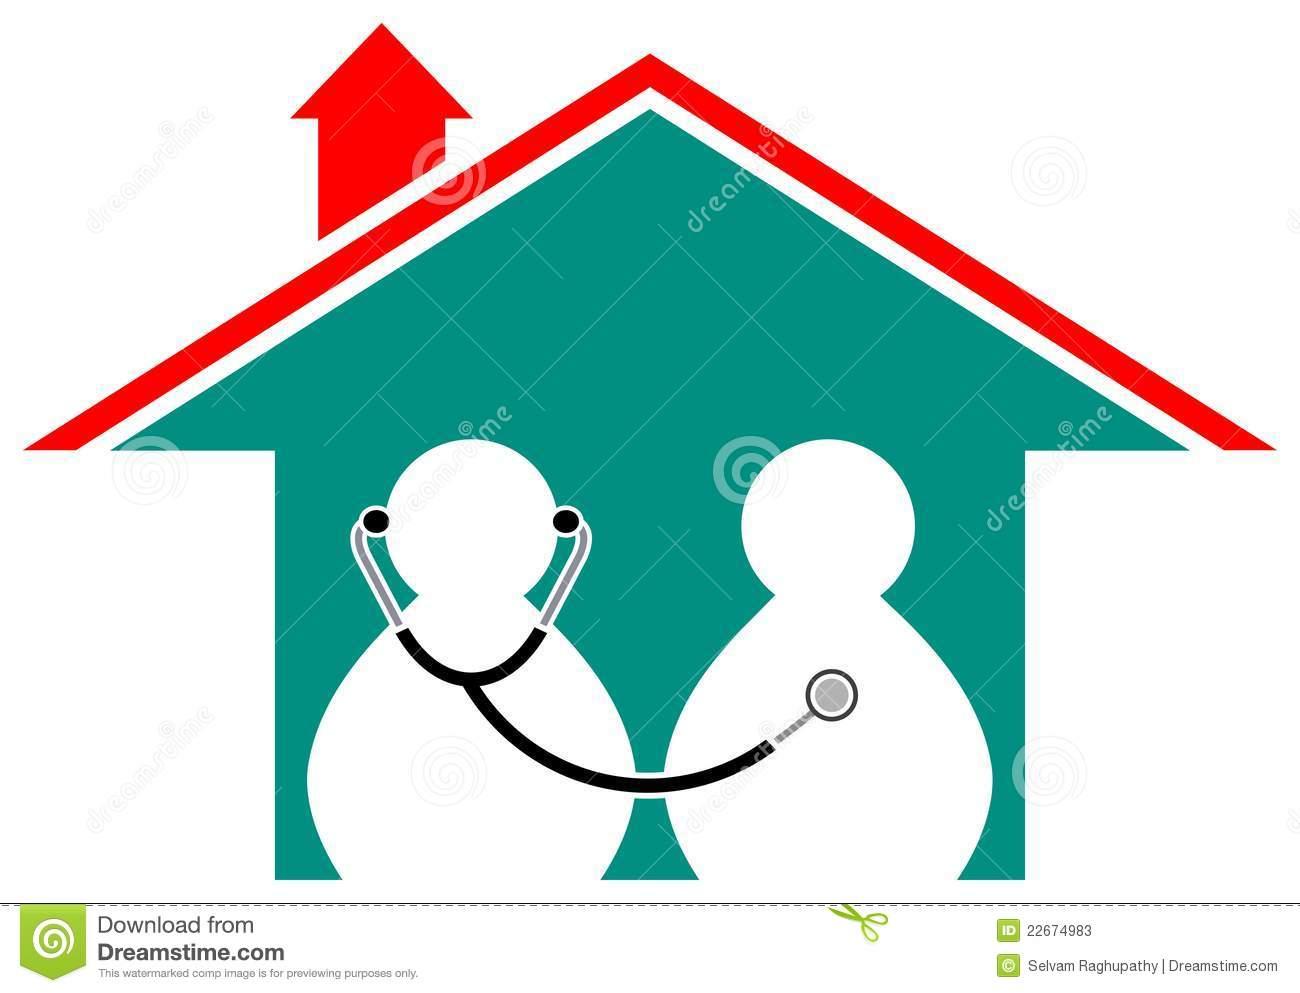 Healthcare: BelHealth acquires Care Advantage Inc.